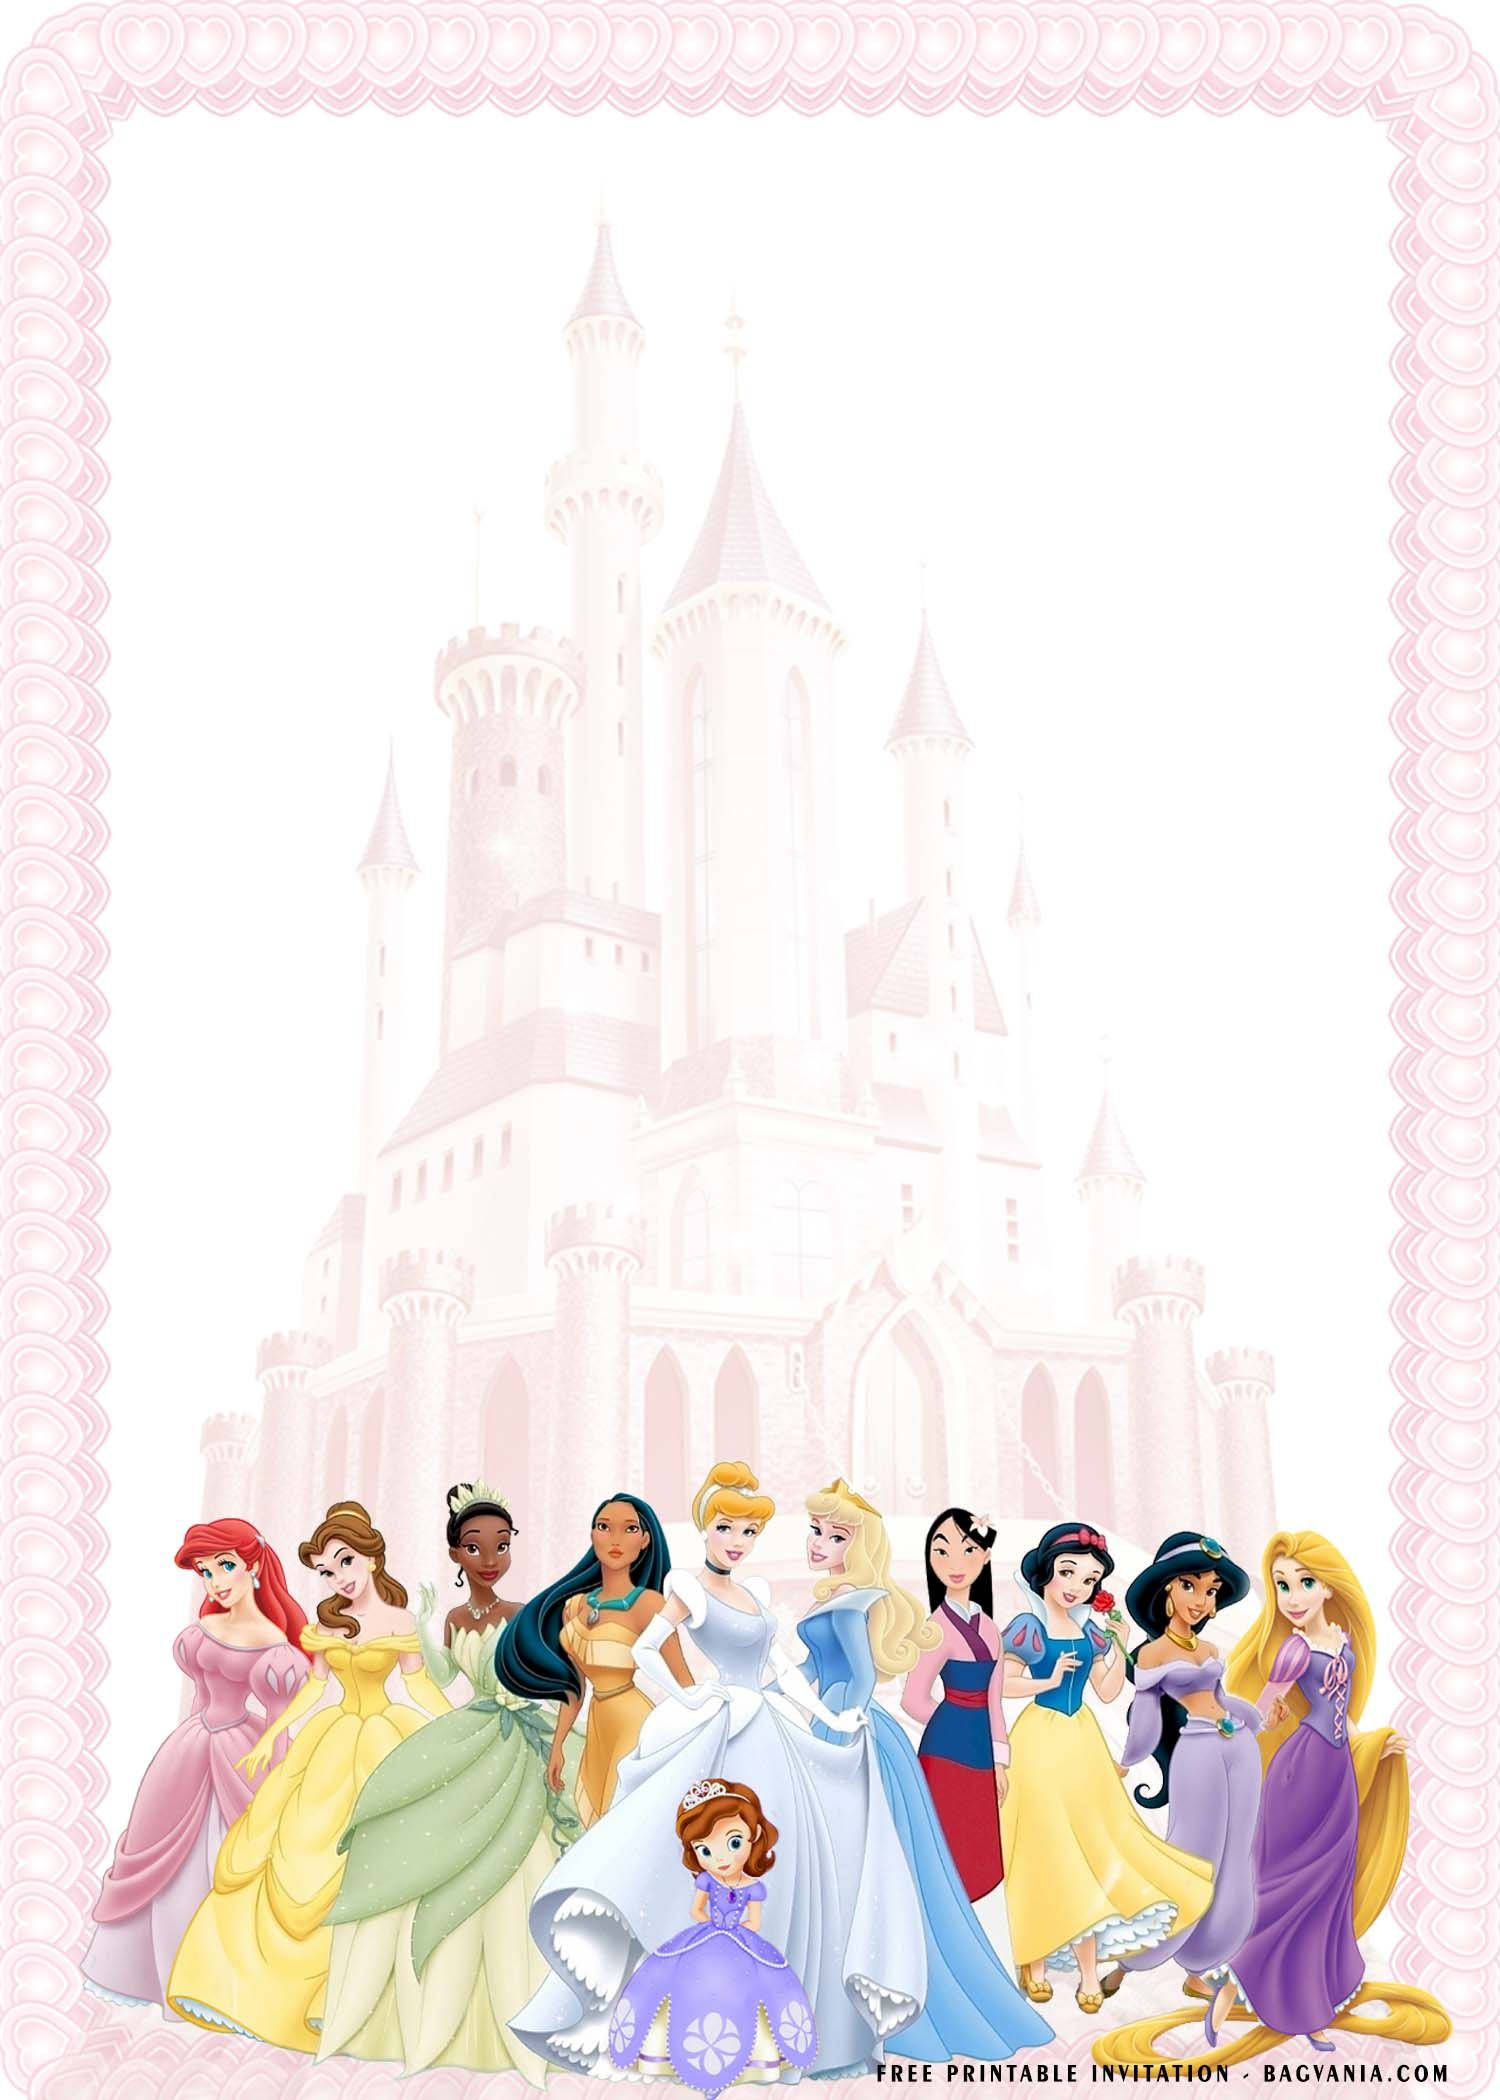 Cool Free Template Free Printable Ornate Disney Princesses Invitation Disney Princess Invitations Disney Princess Birthday Party Princess Invitations